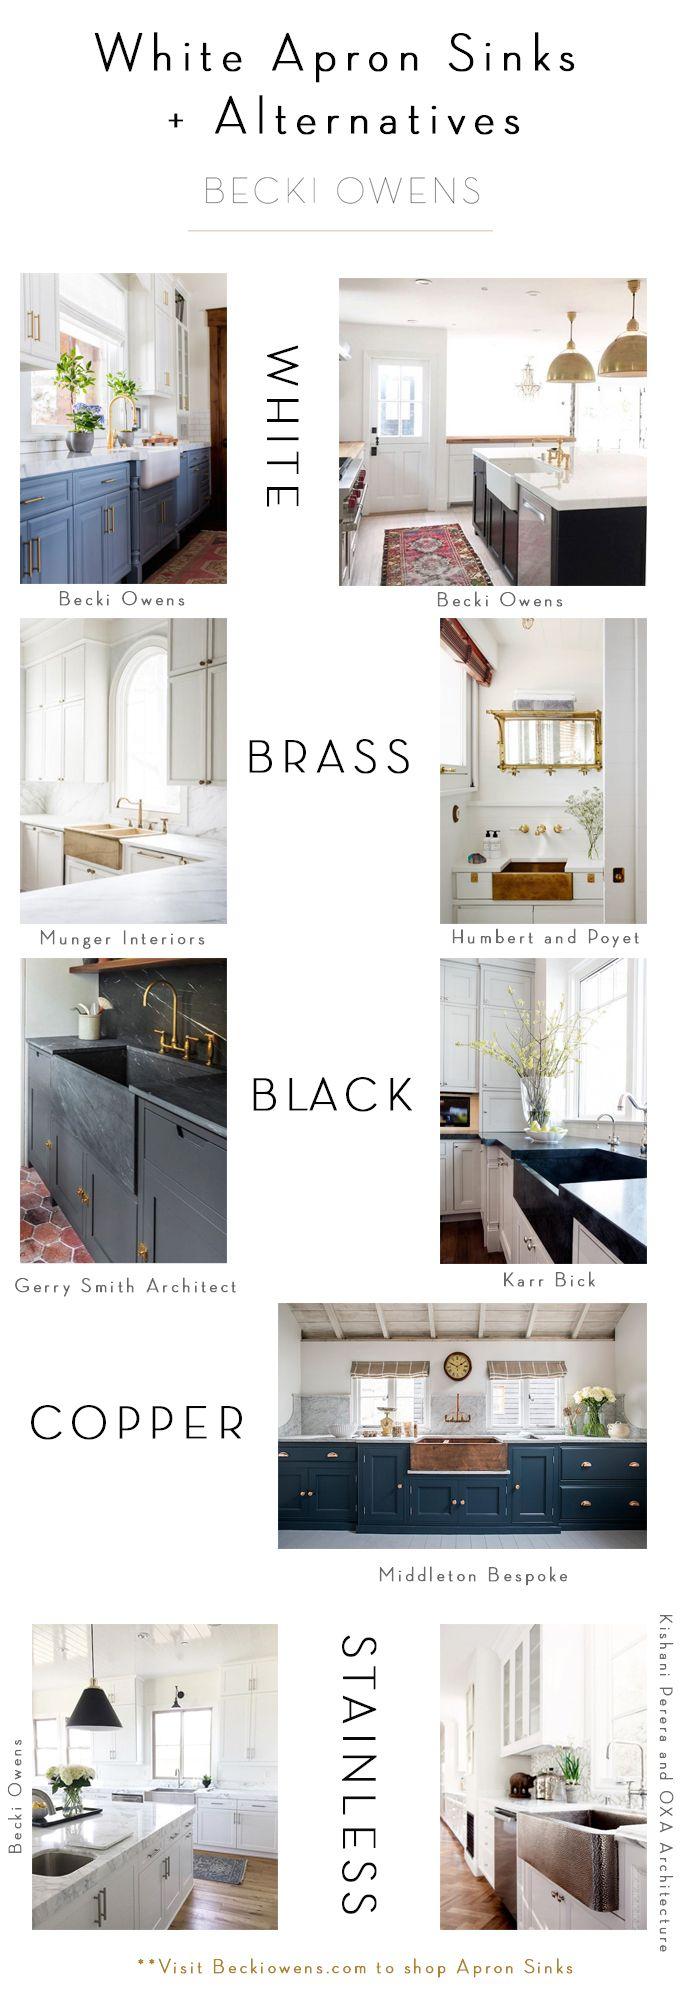 BECKI OWENS- White Apron Sink + Alternatives